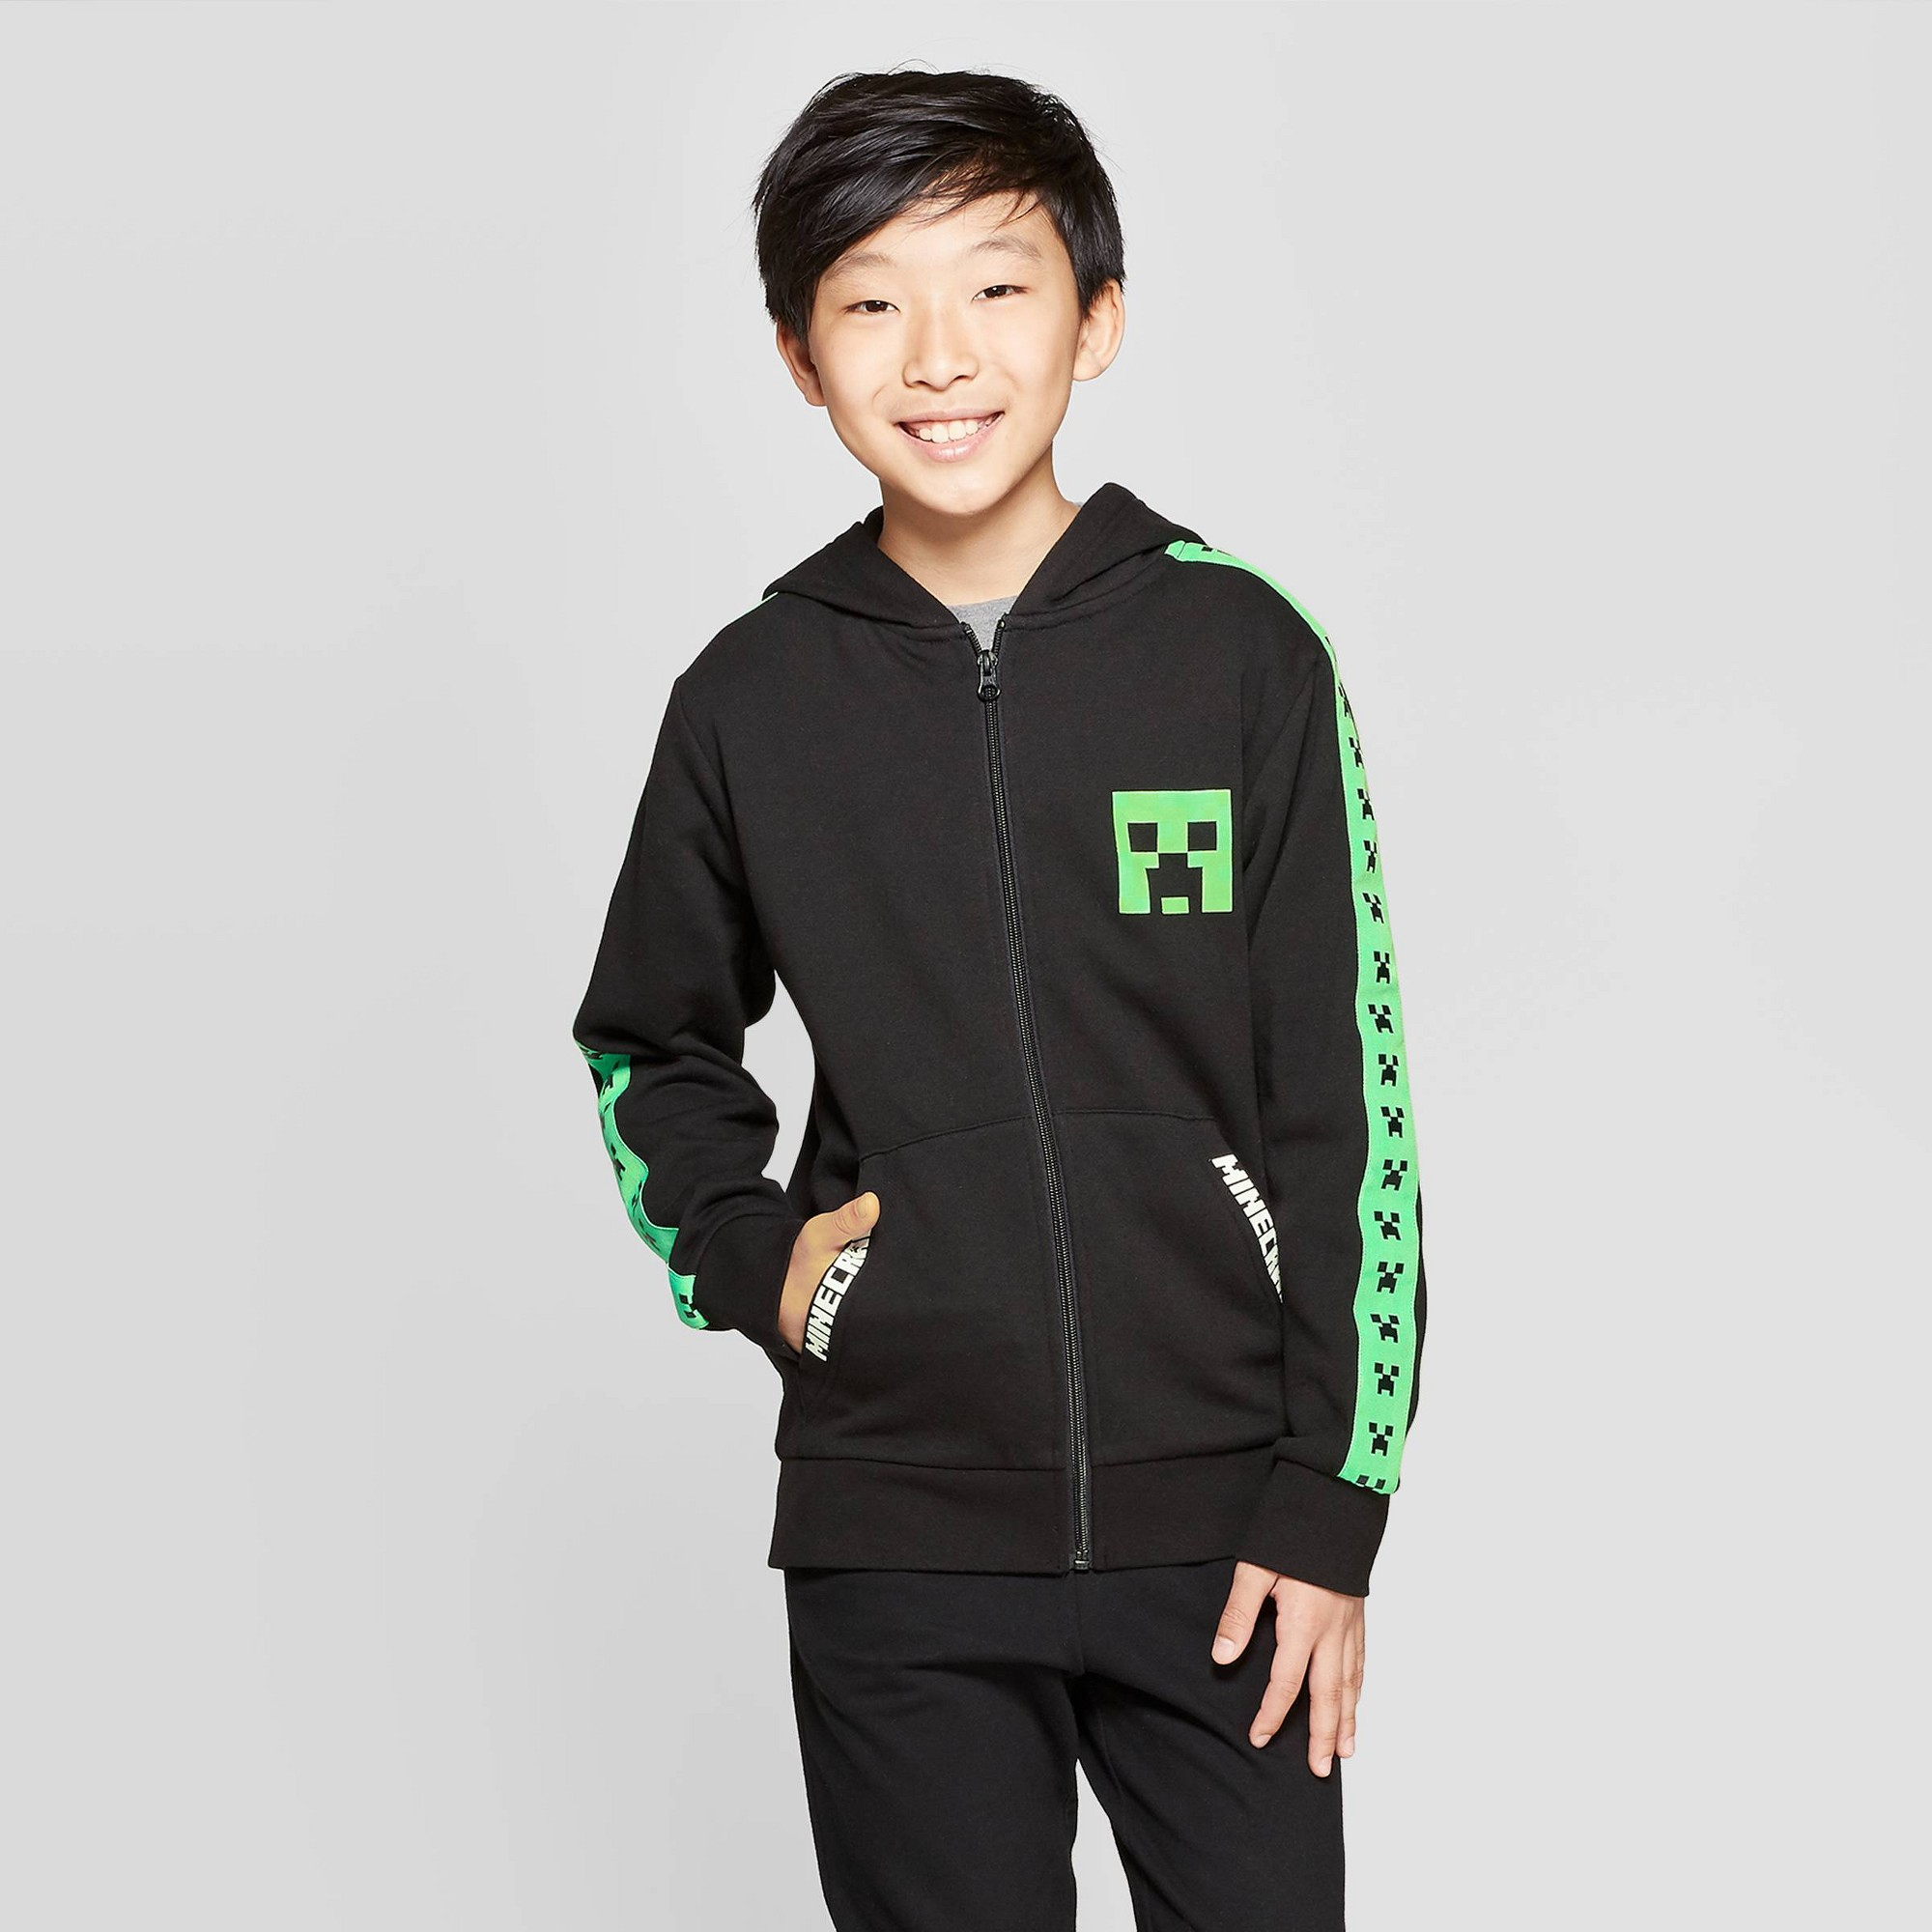 Boys' Minecraft Black Creeper Hoodie - Black/Green XS, Green Black